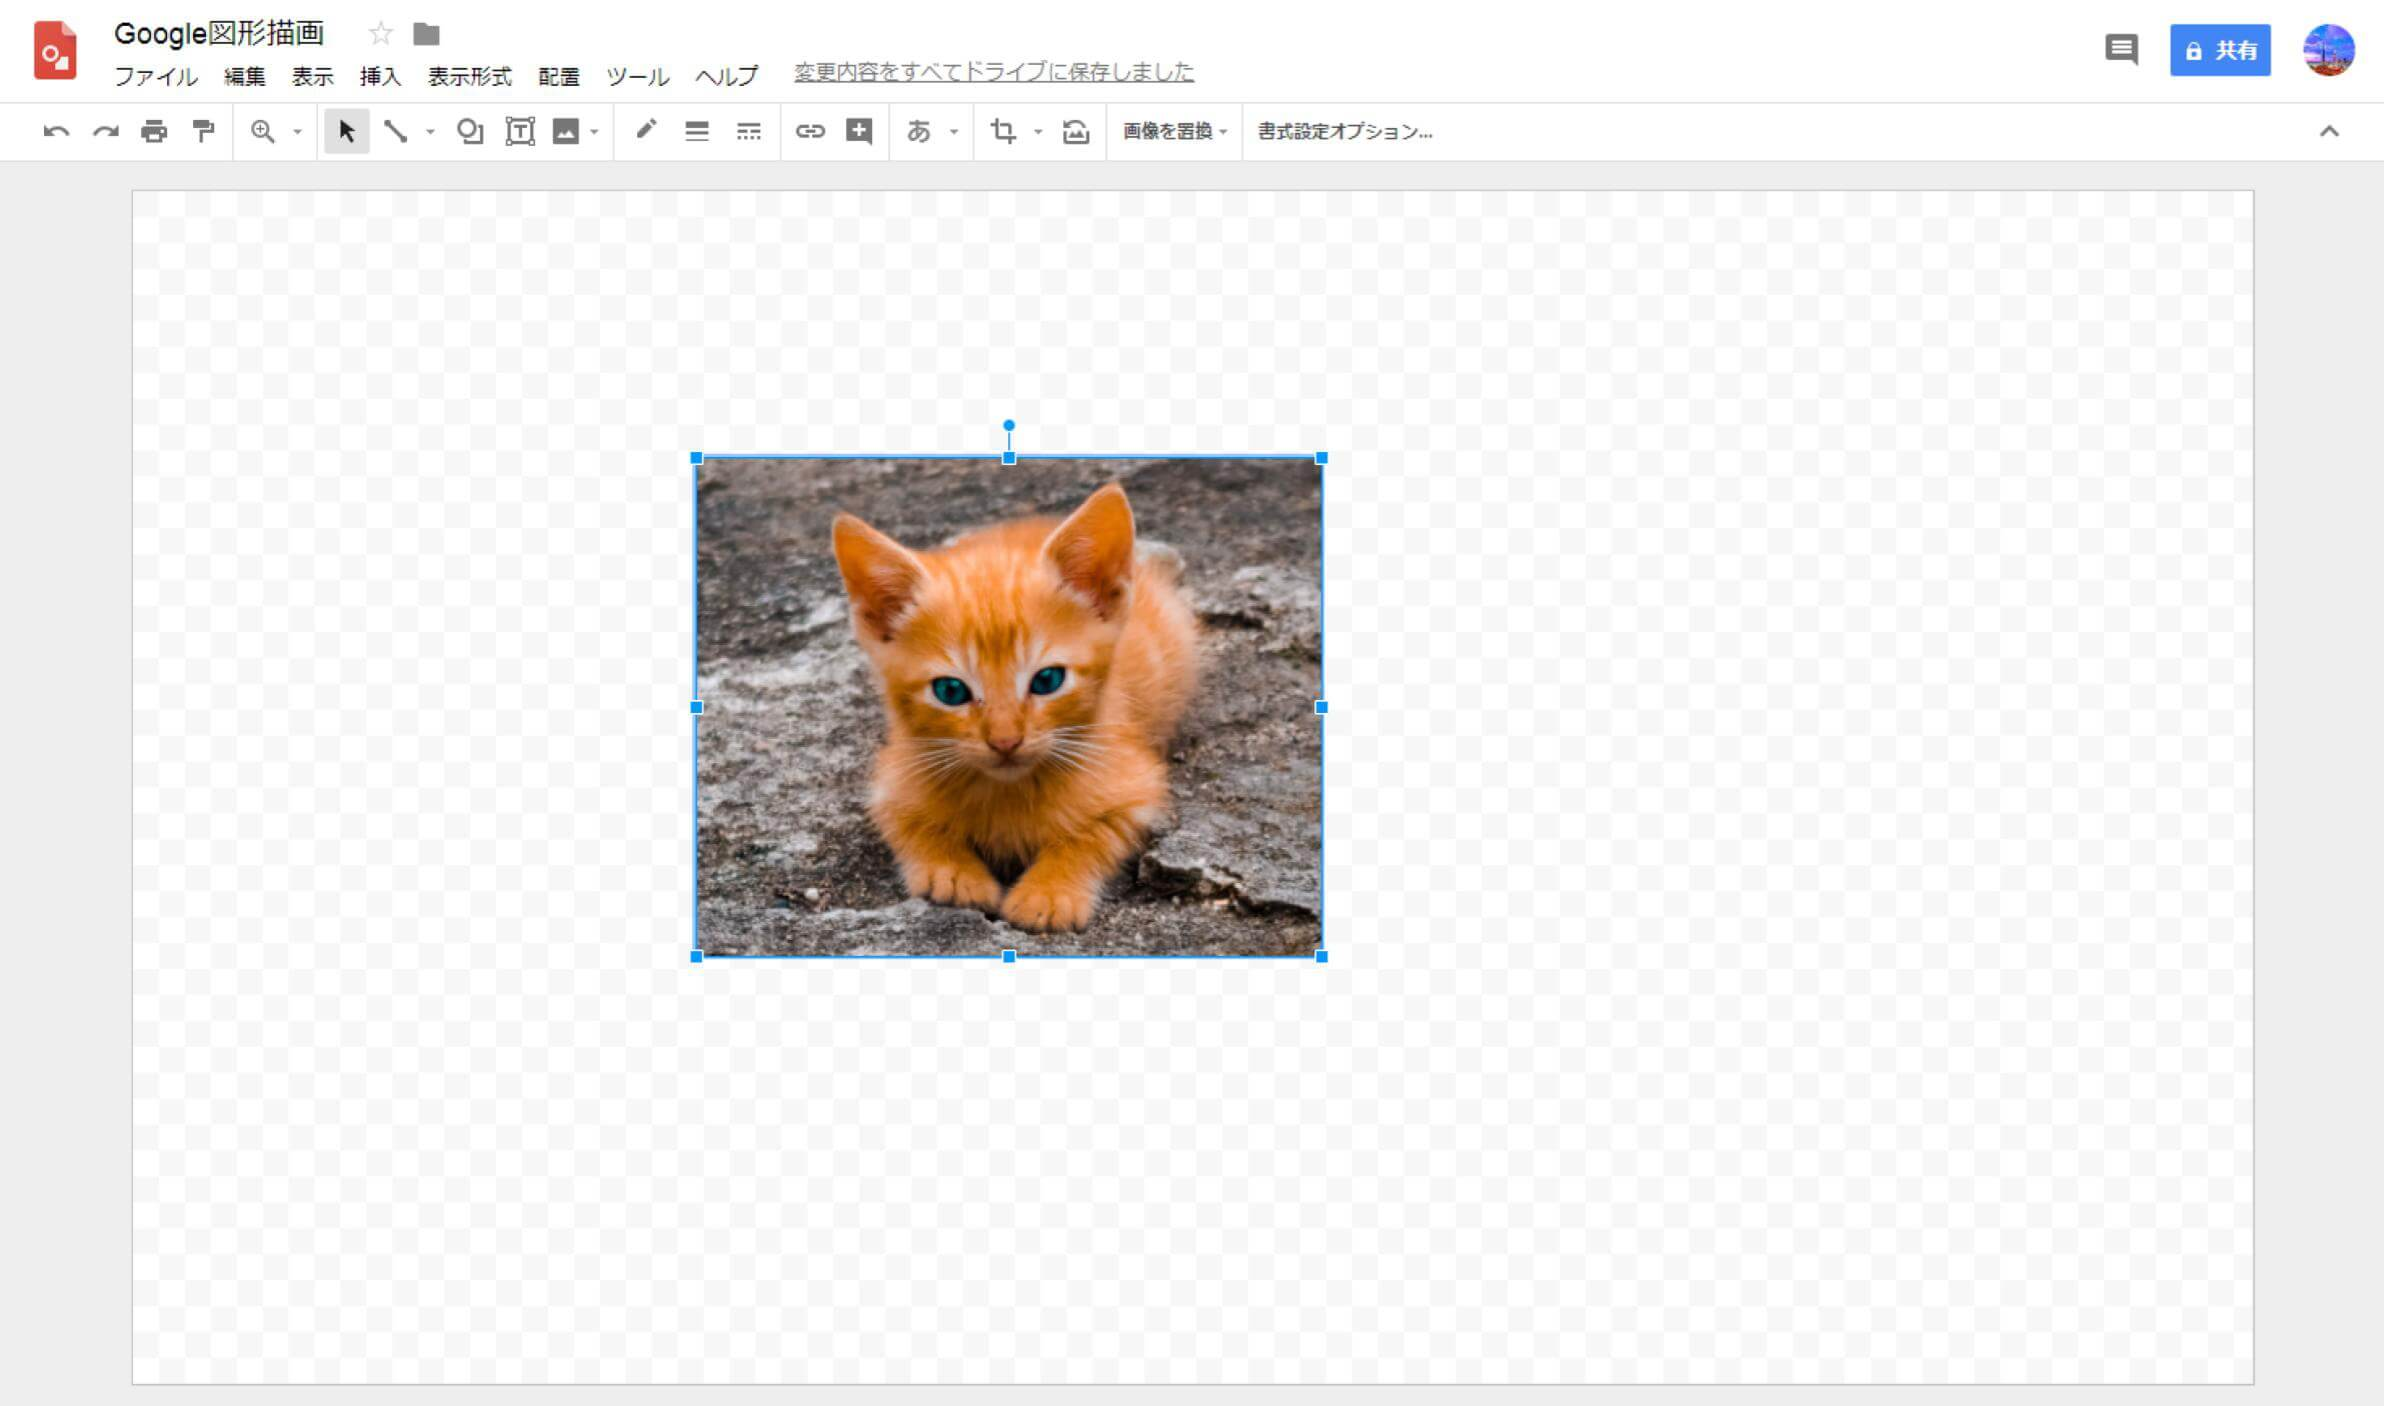 Google図形描画 画像を切り抜き完了